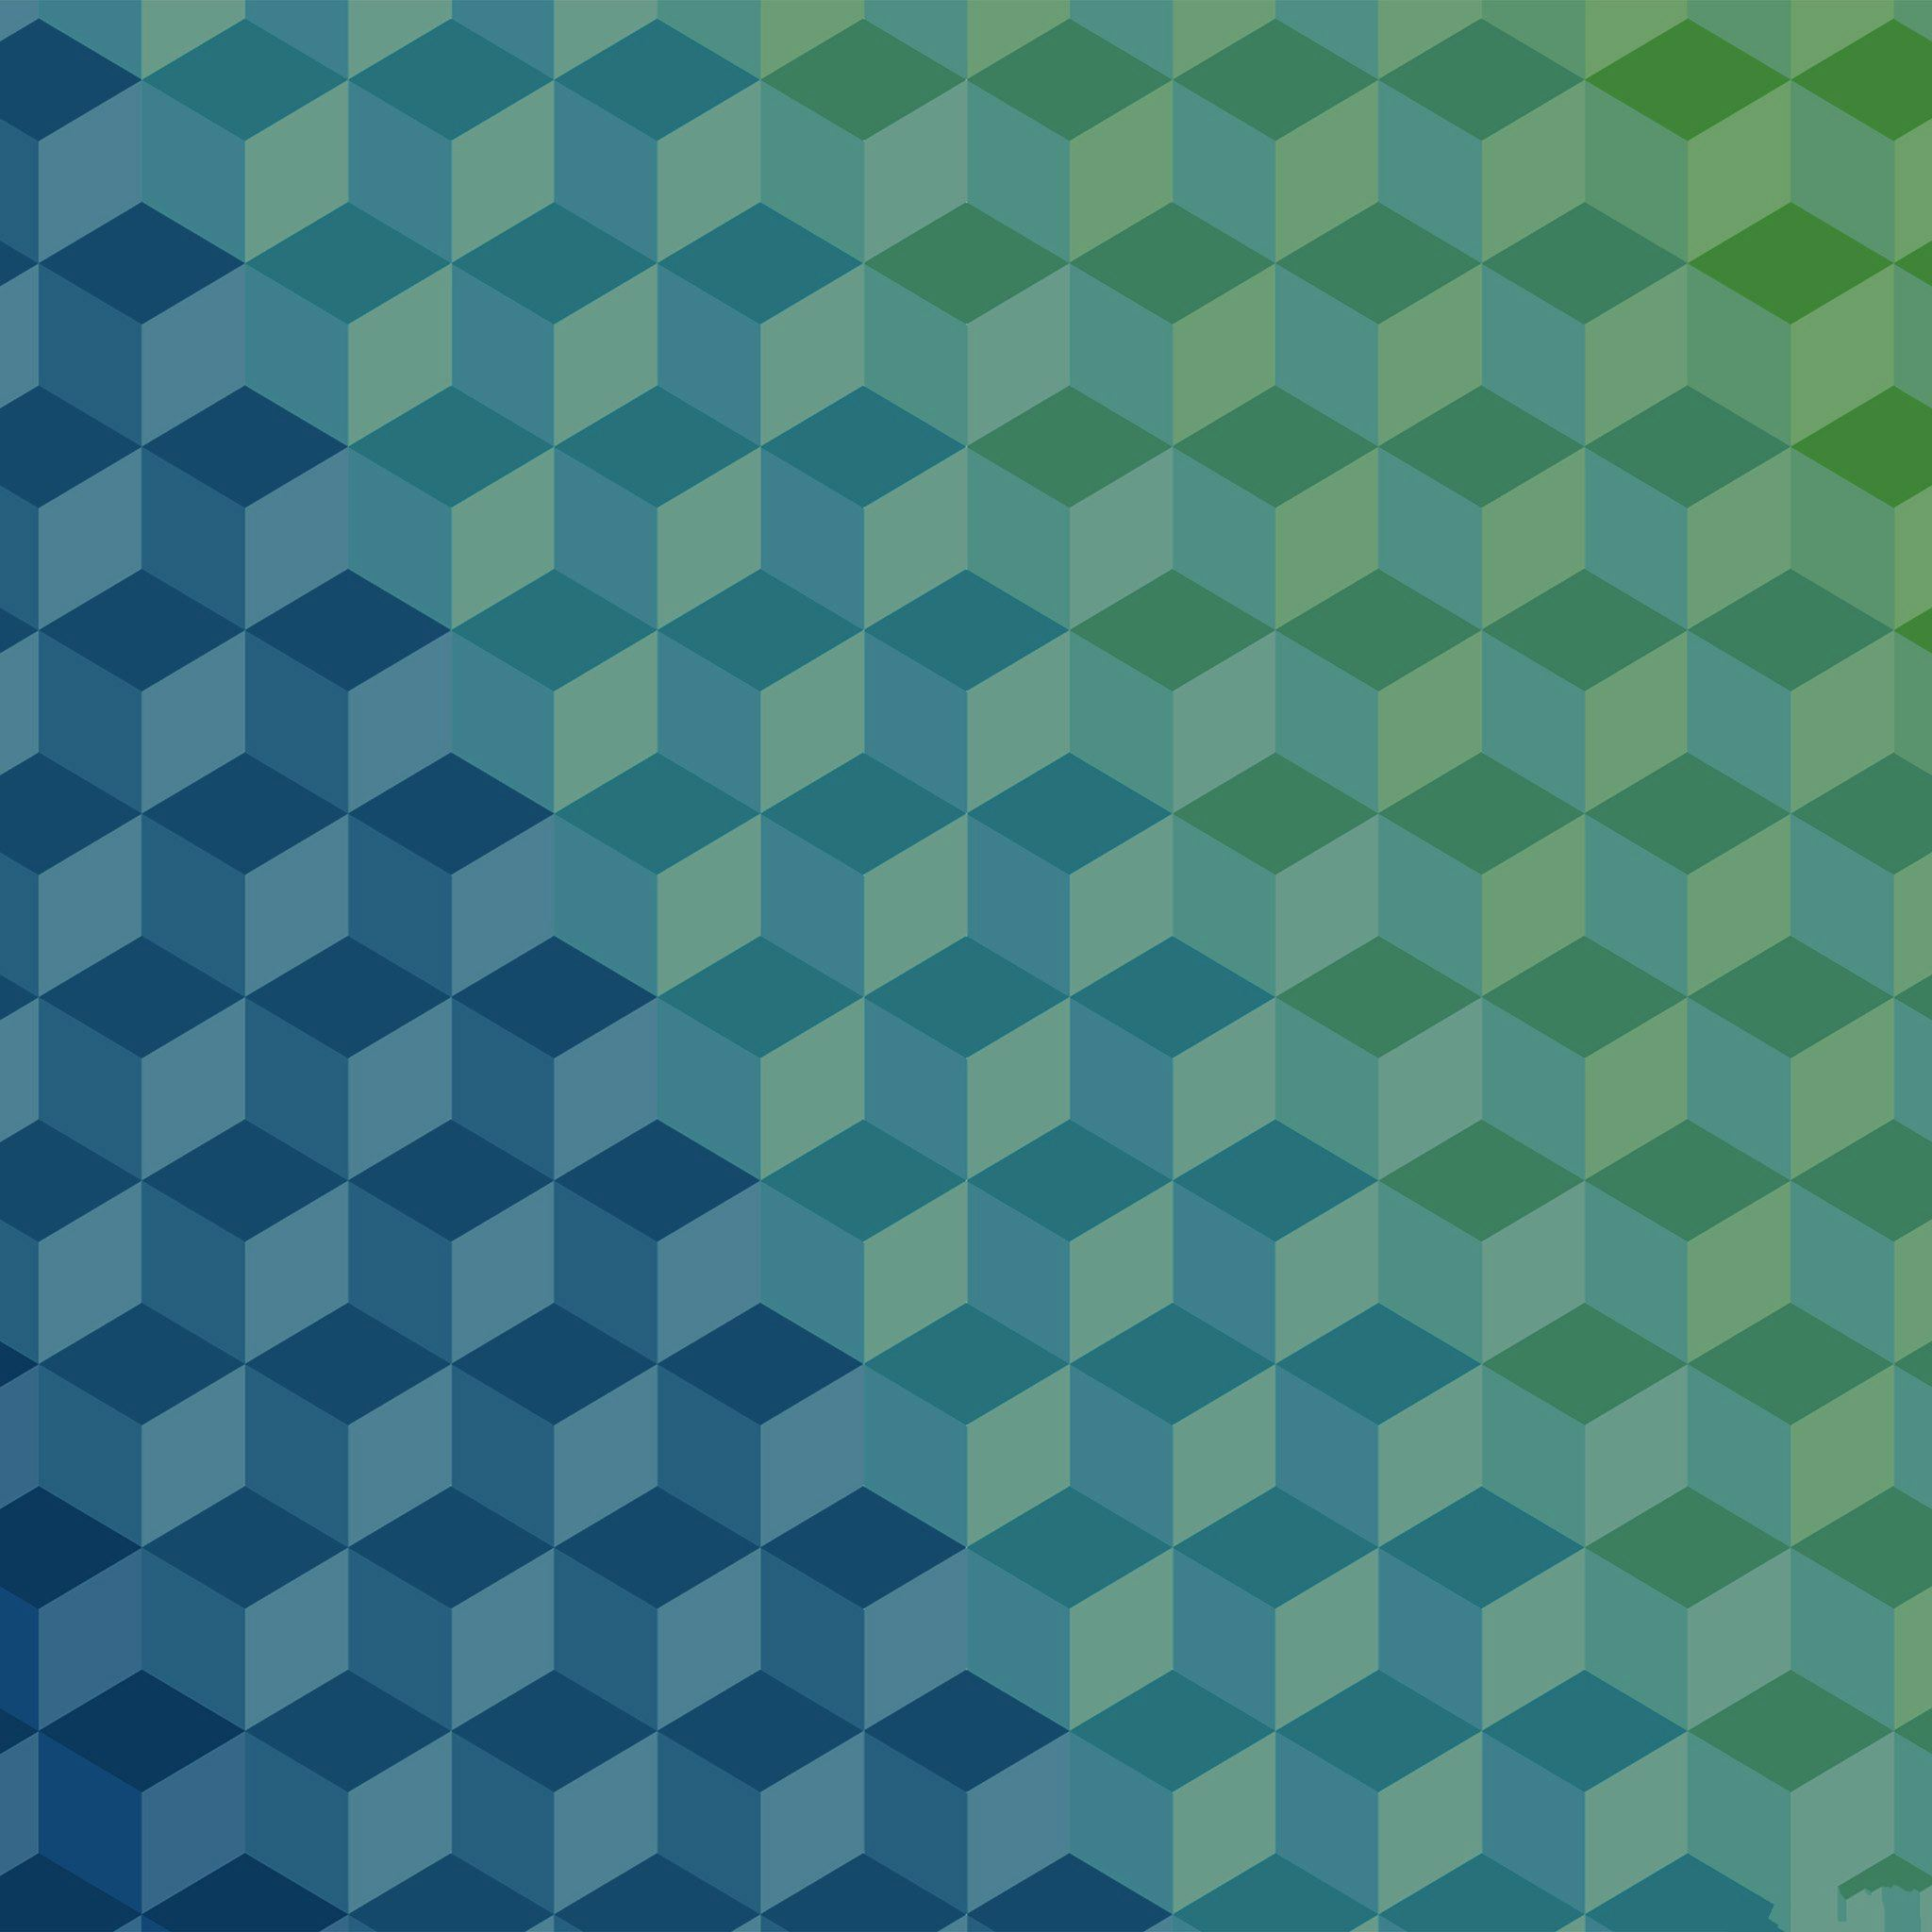 Polygon Blue Art Graphic Pattern IPad Air Wallpaper